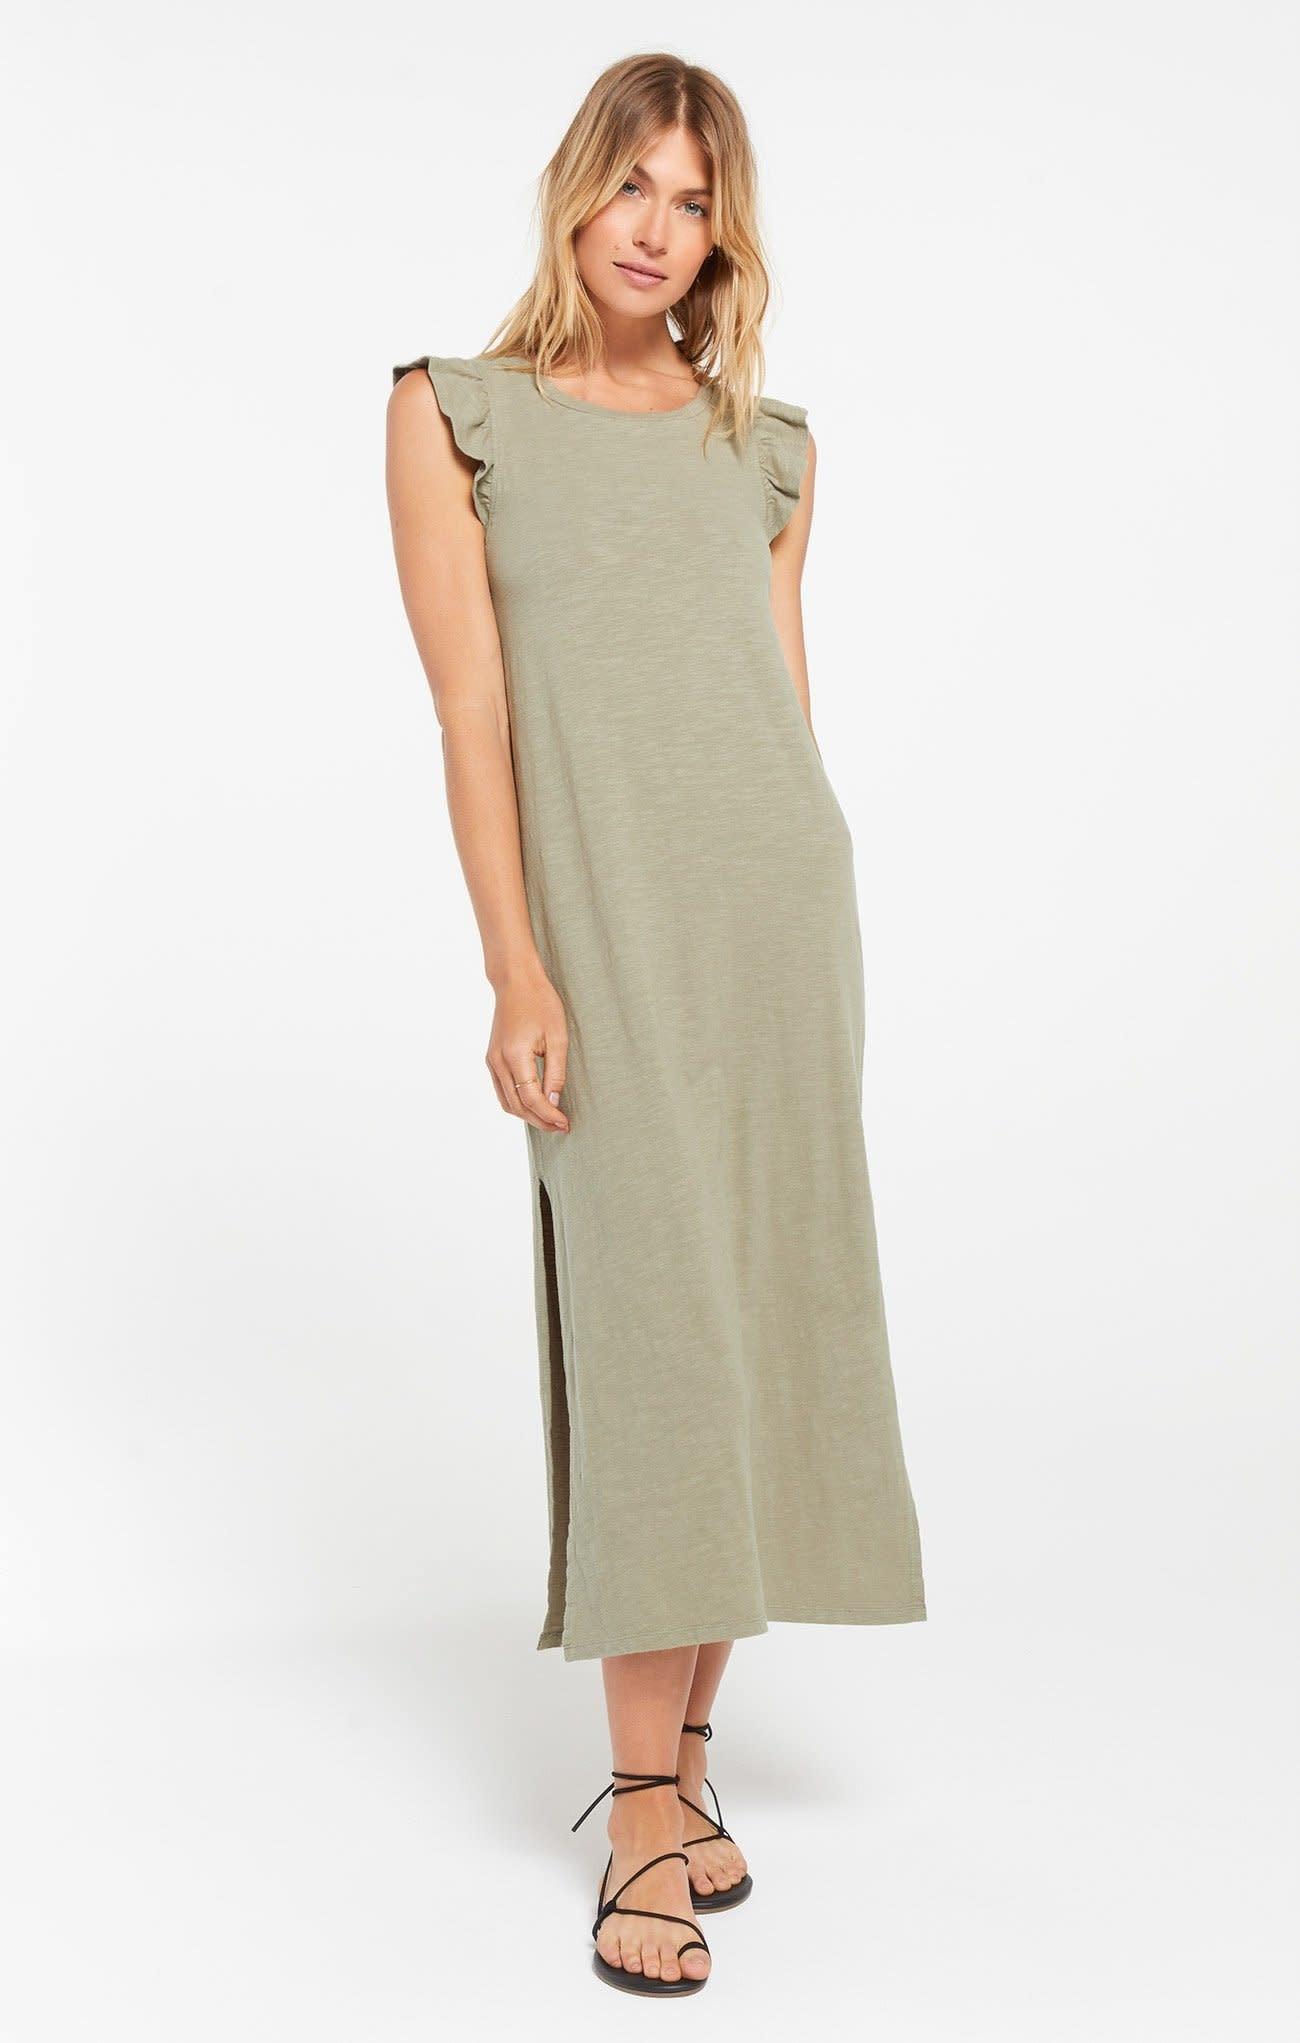 Z Supply Blakely Slub Ruffle Dress